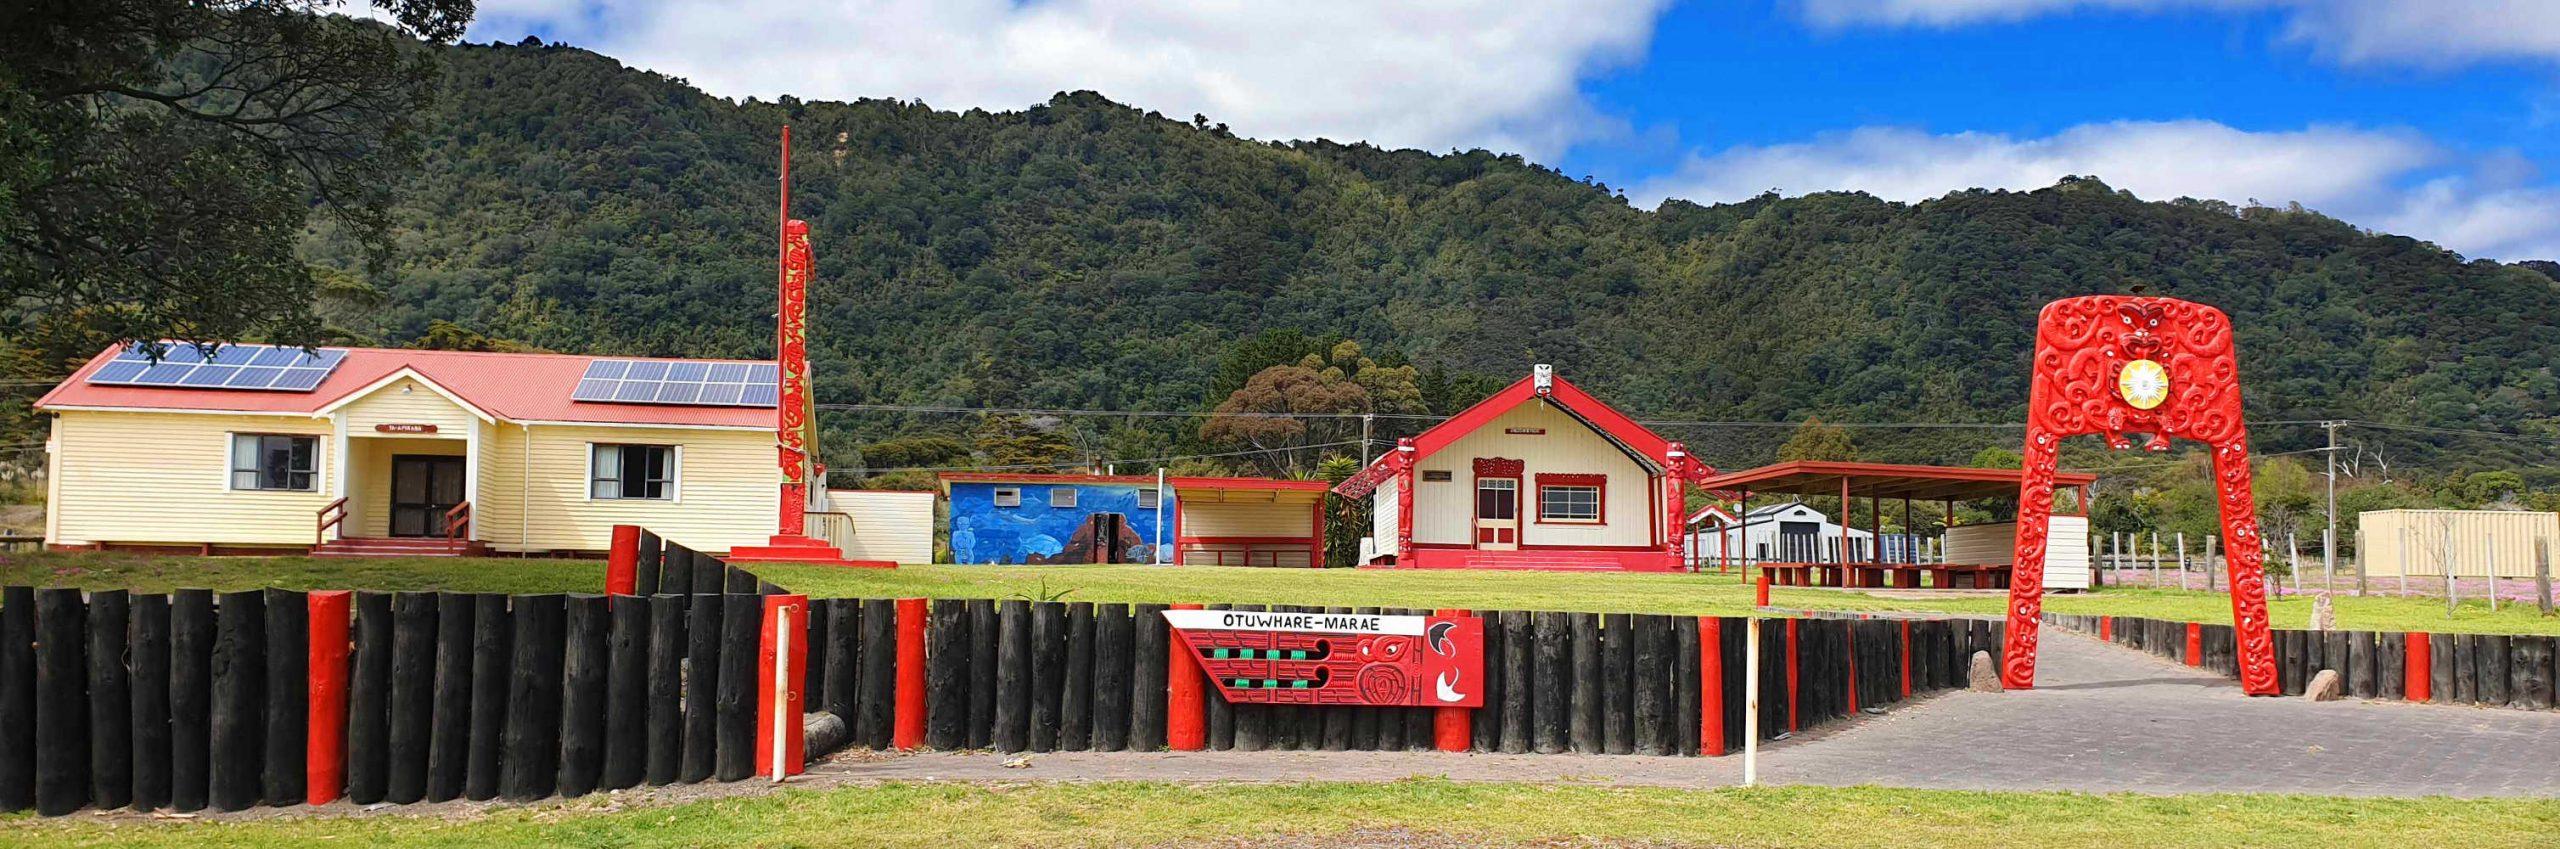 Otuwhare Marae, Omaio, Te Kaha vicnity East Cape, North Island,New Zealand